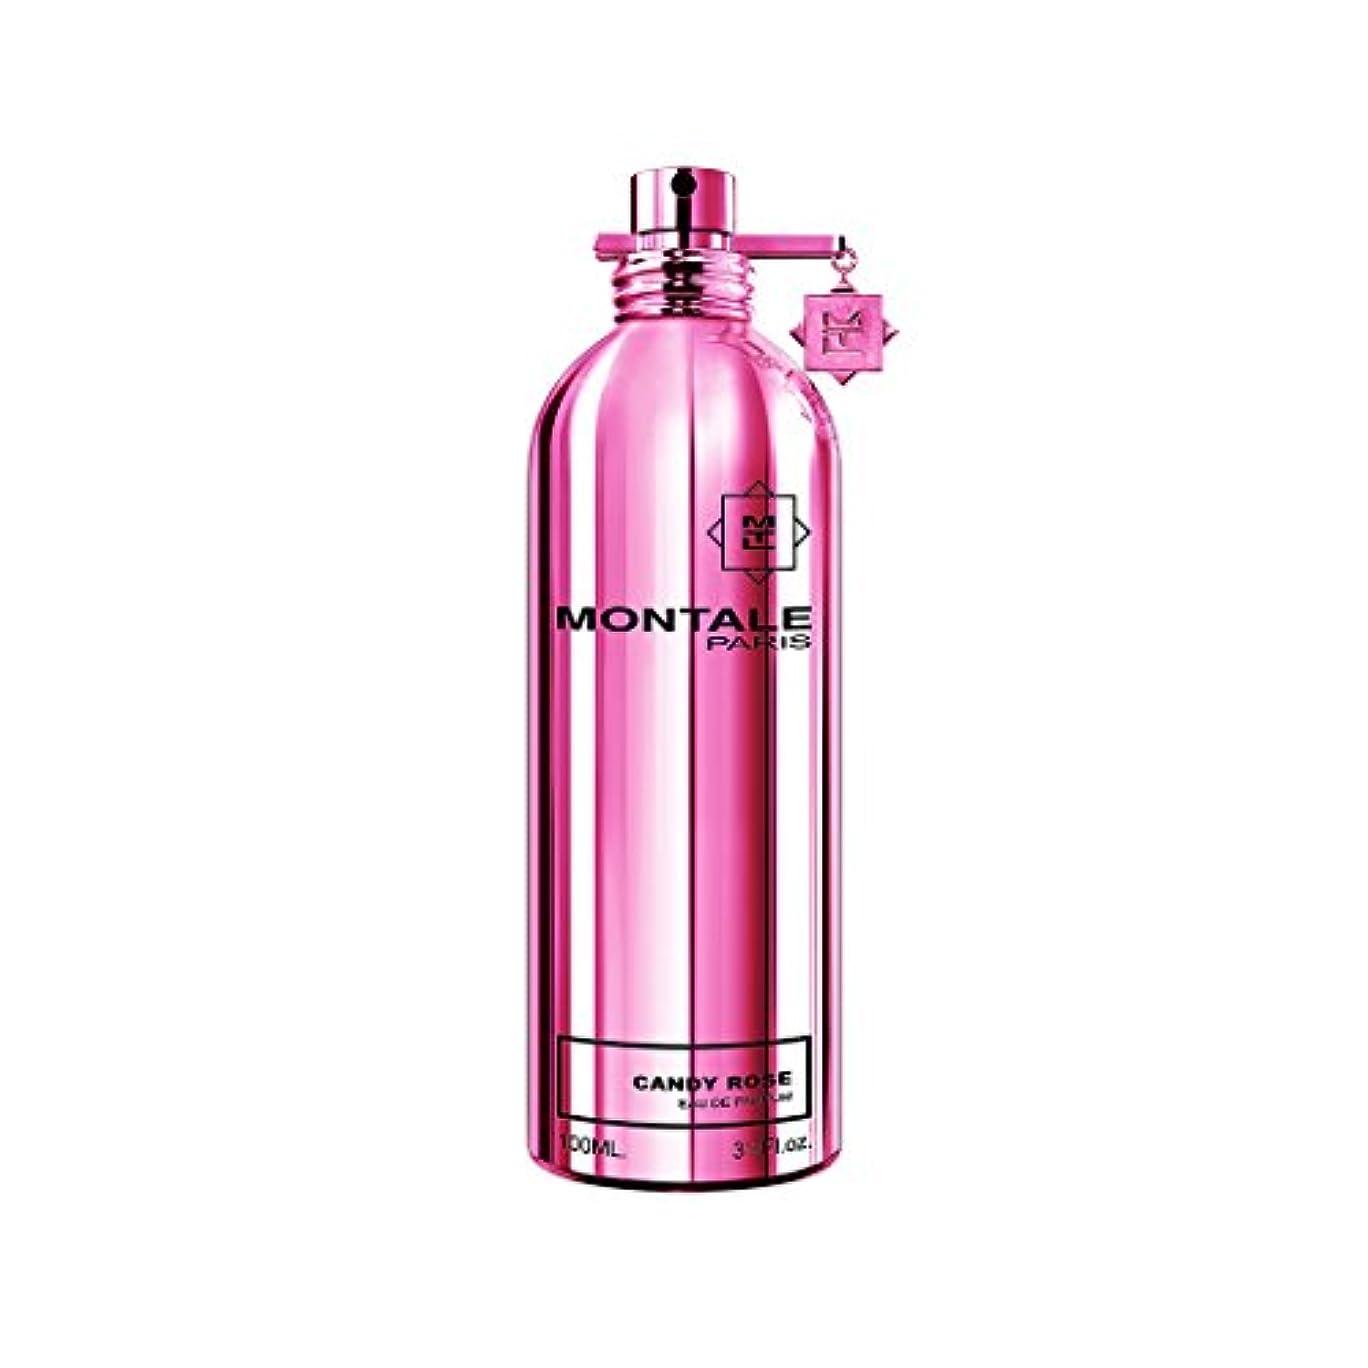 二週間モード疲労Montale Candy Rose by Montale Eau De Parfum Spray 3.4 oz / 100 ml (Women)